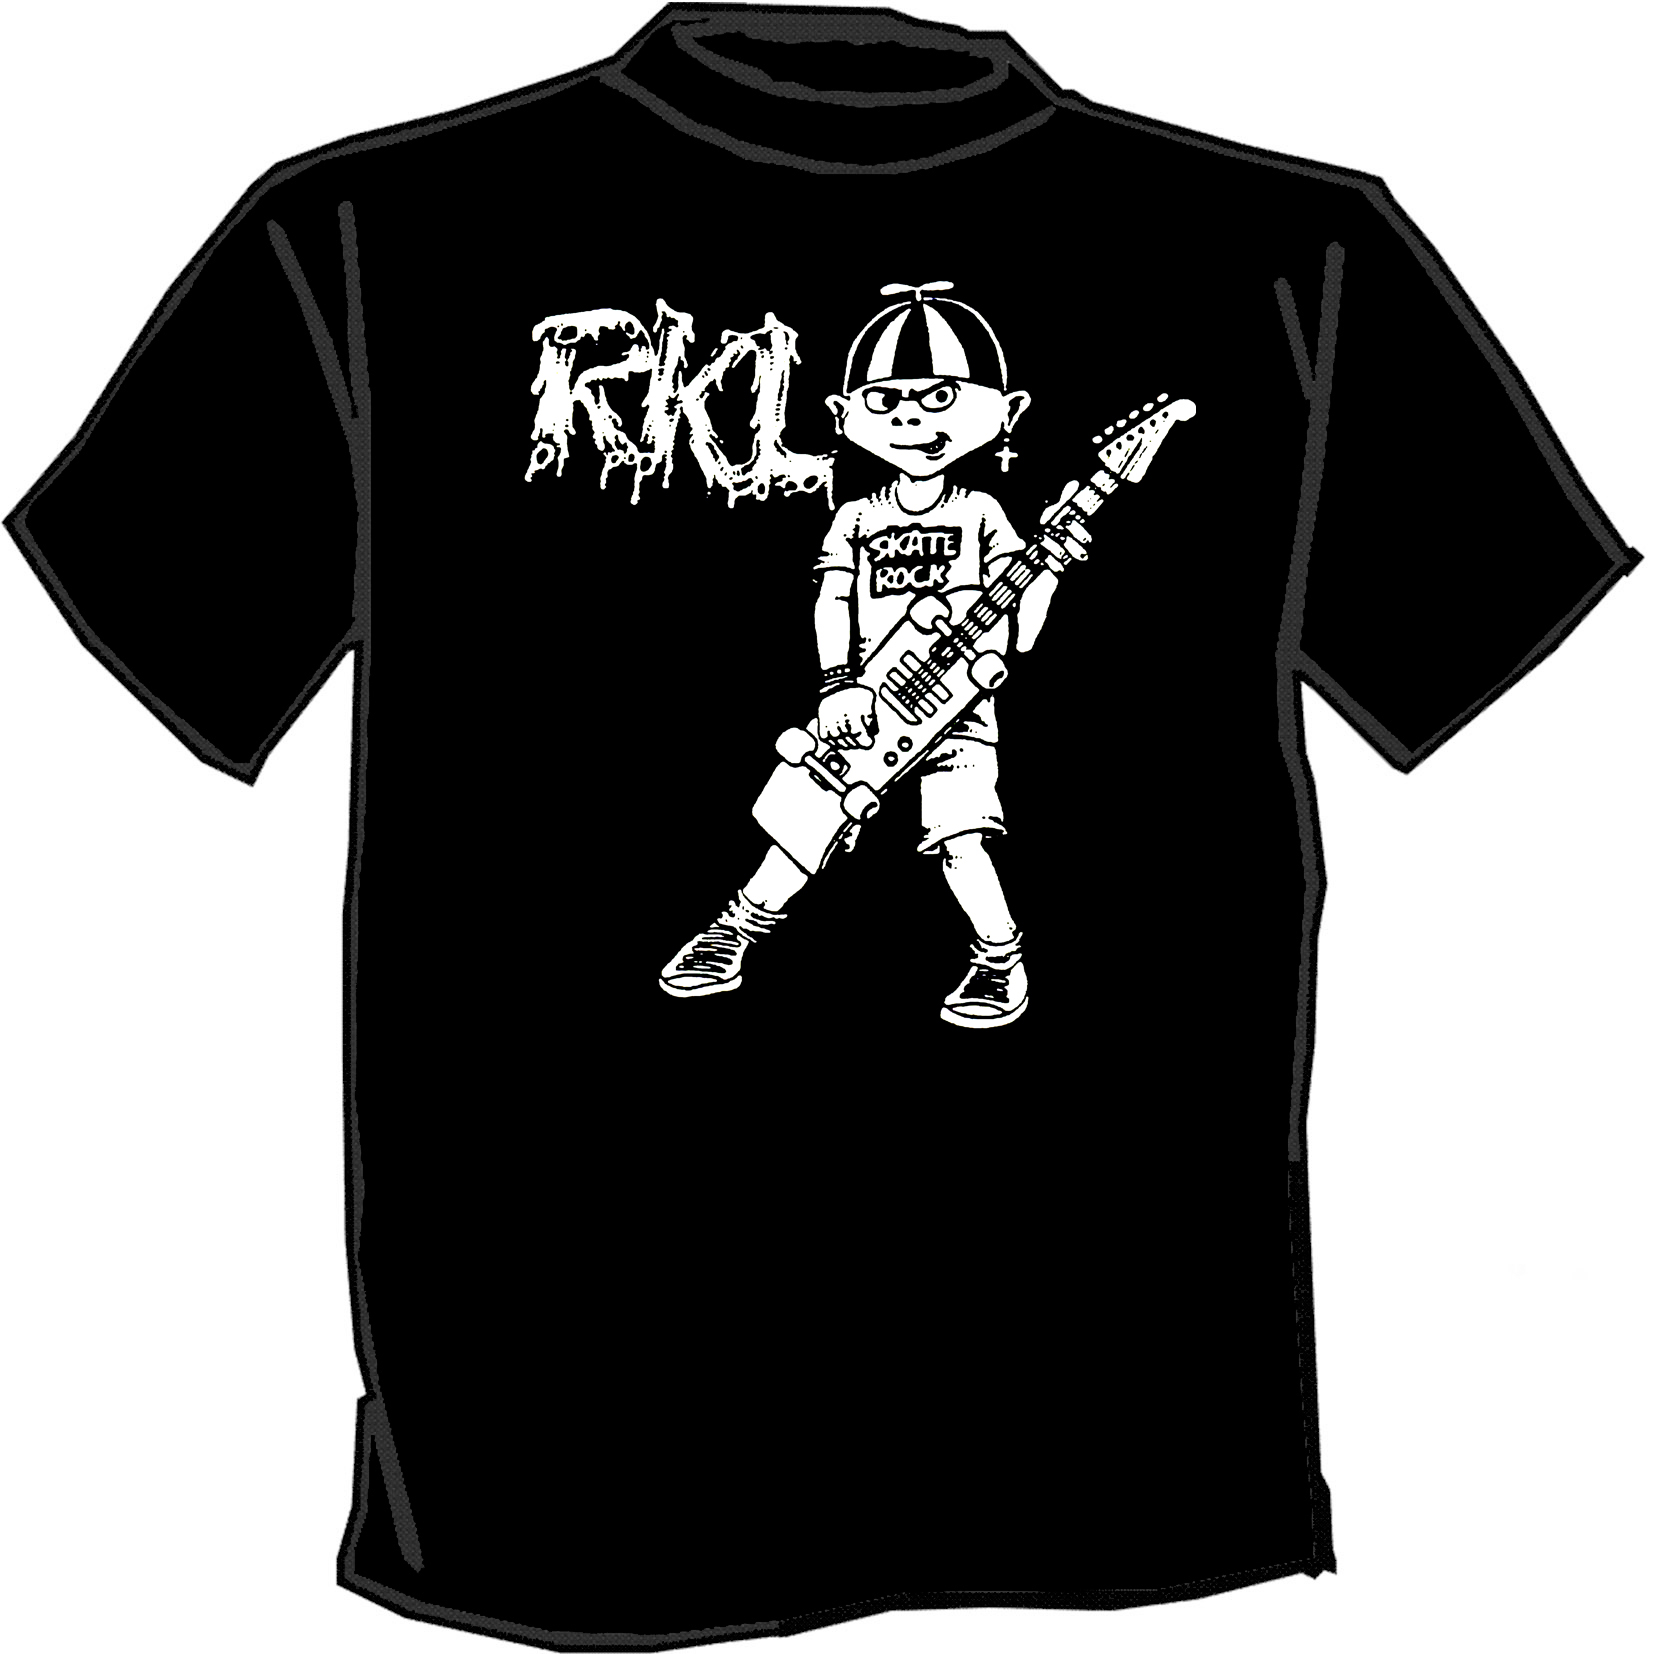 Rkl punk band t shirt silk screened screenprinted screen for Silk screen tee shirts online